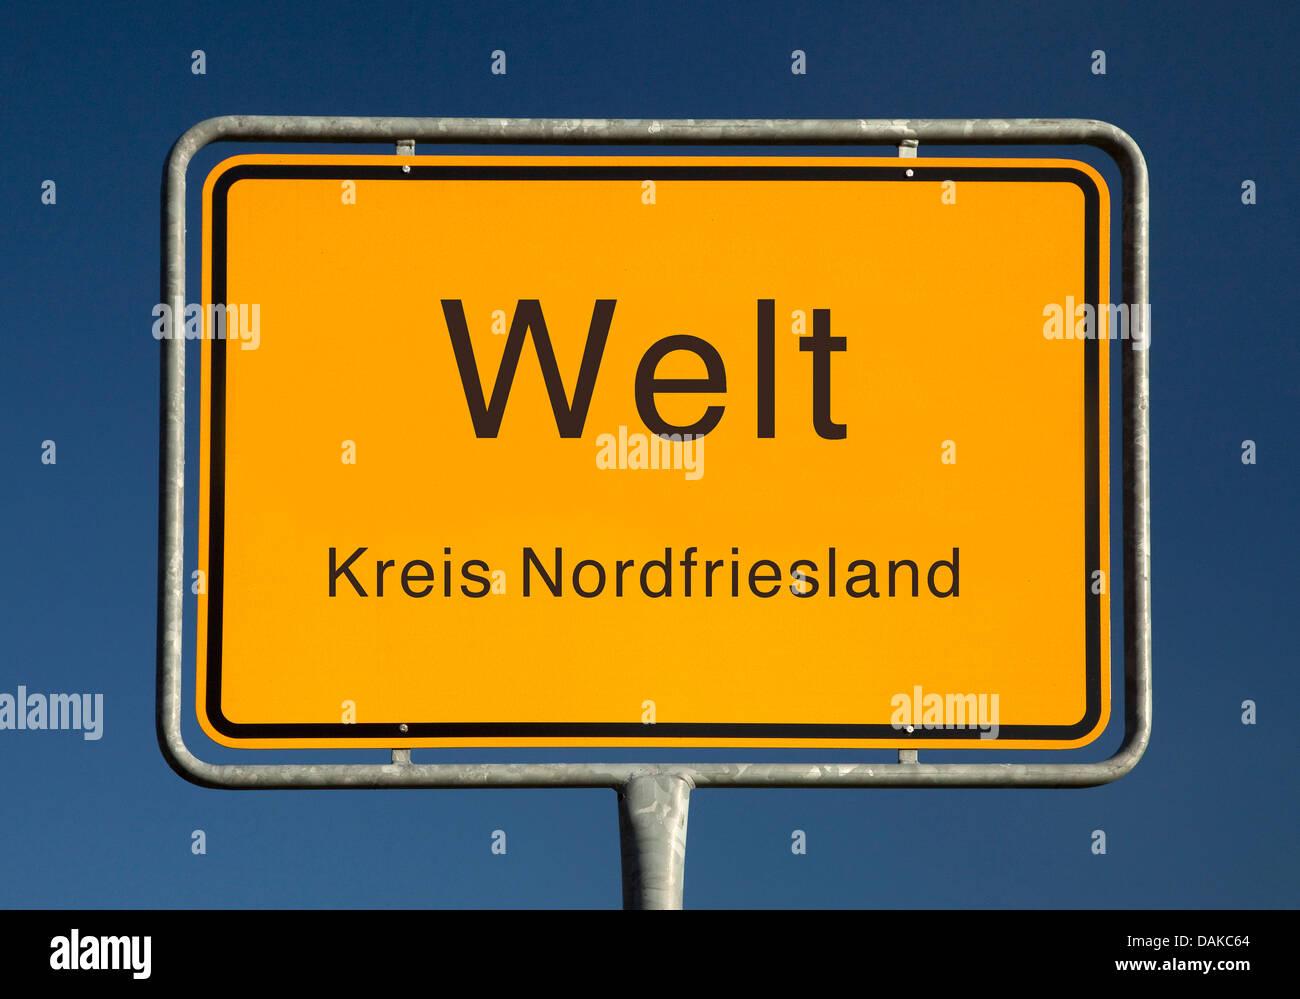 Welt place name sign, Germany, Schleswig-Holstein, Welt - Stock Image